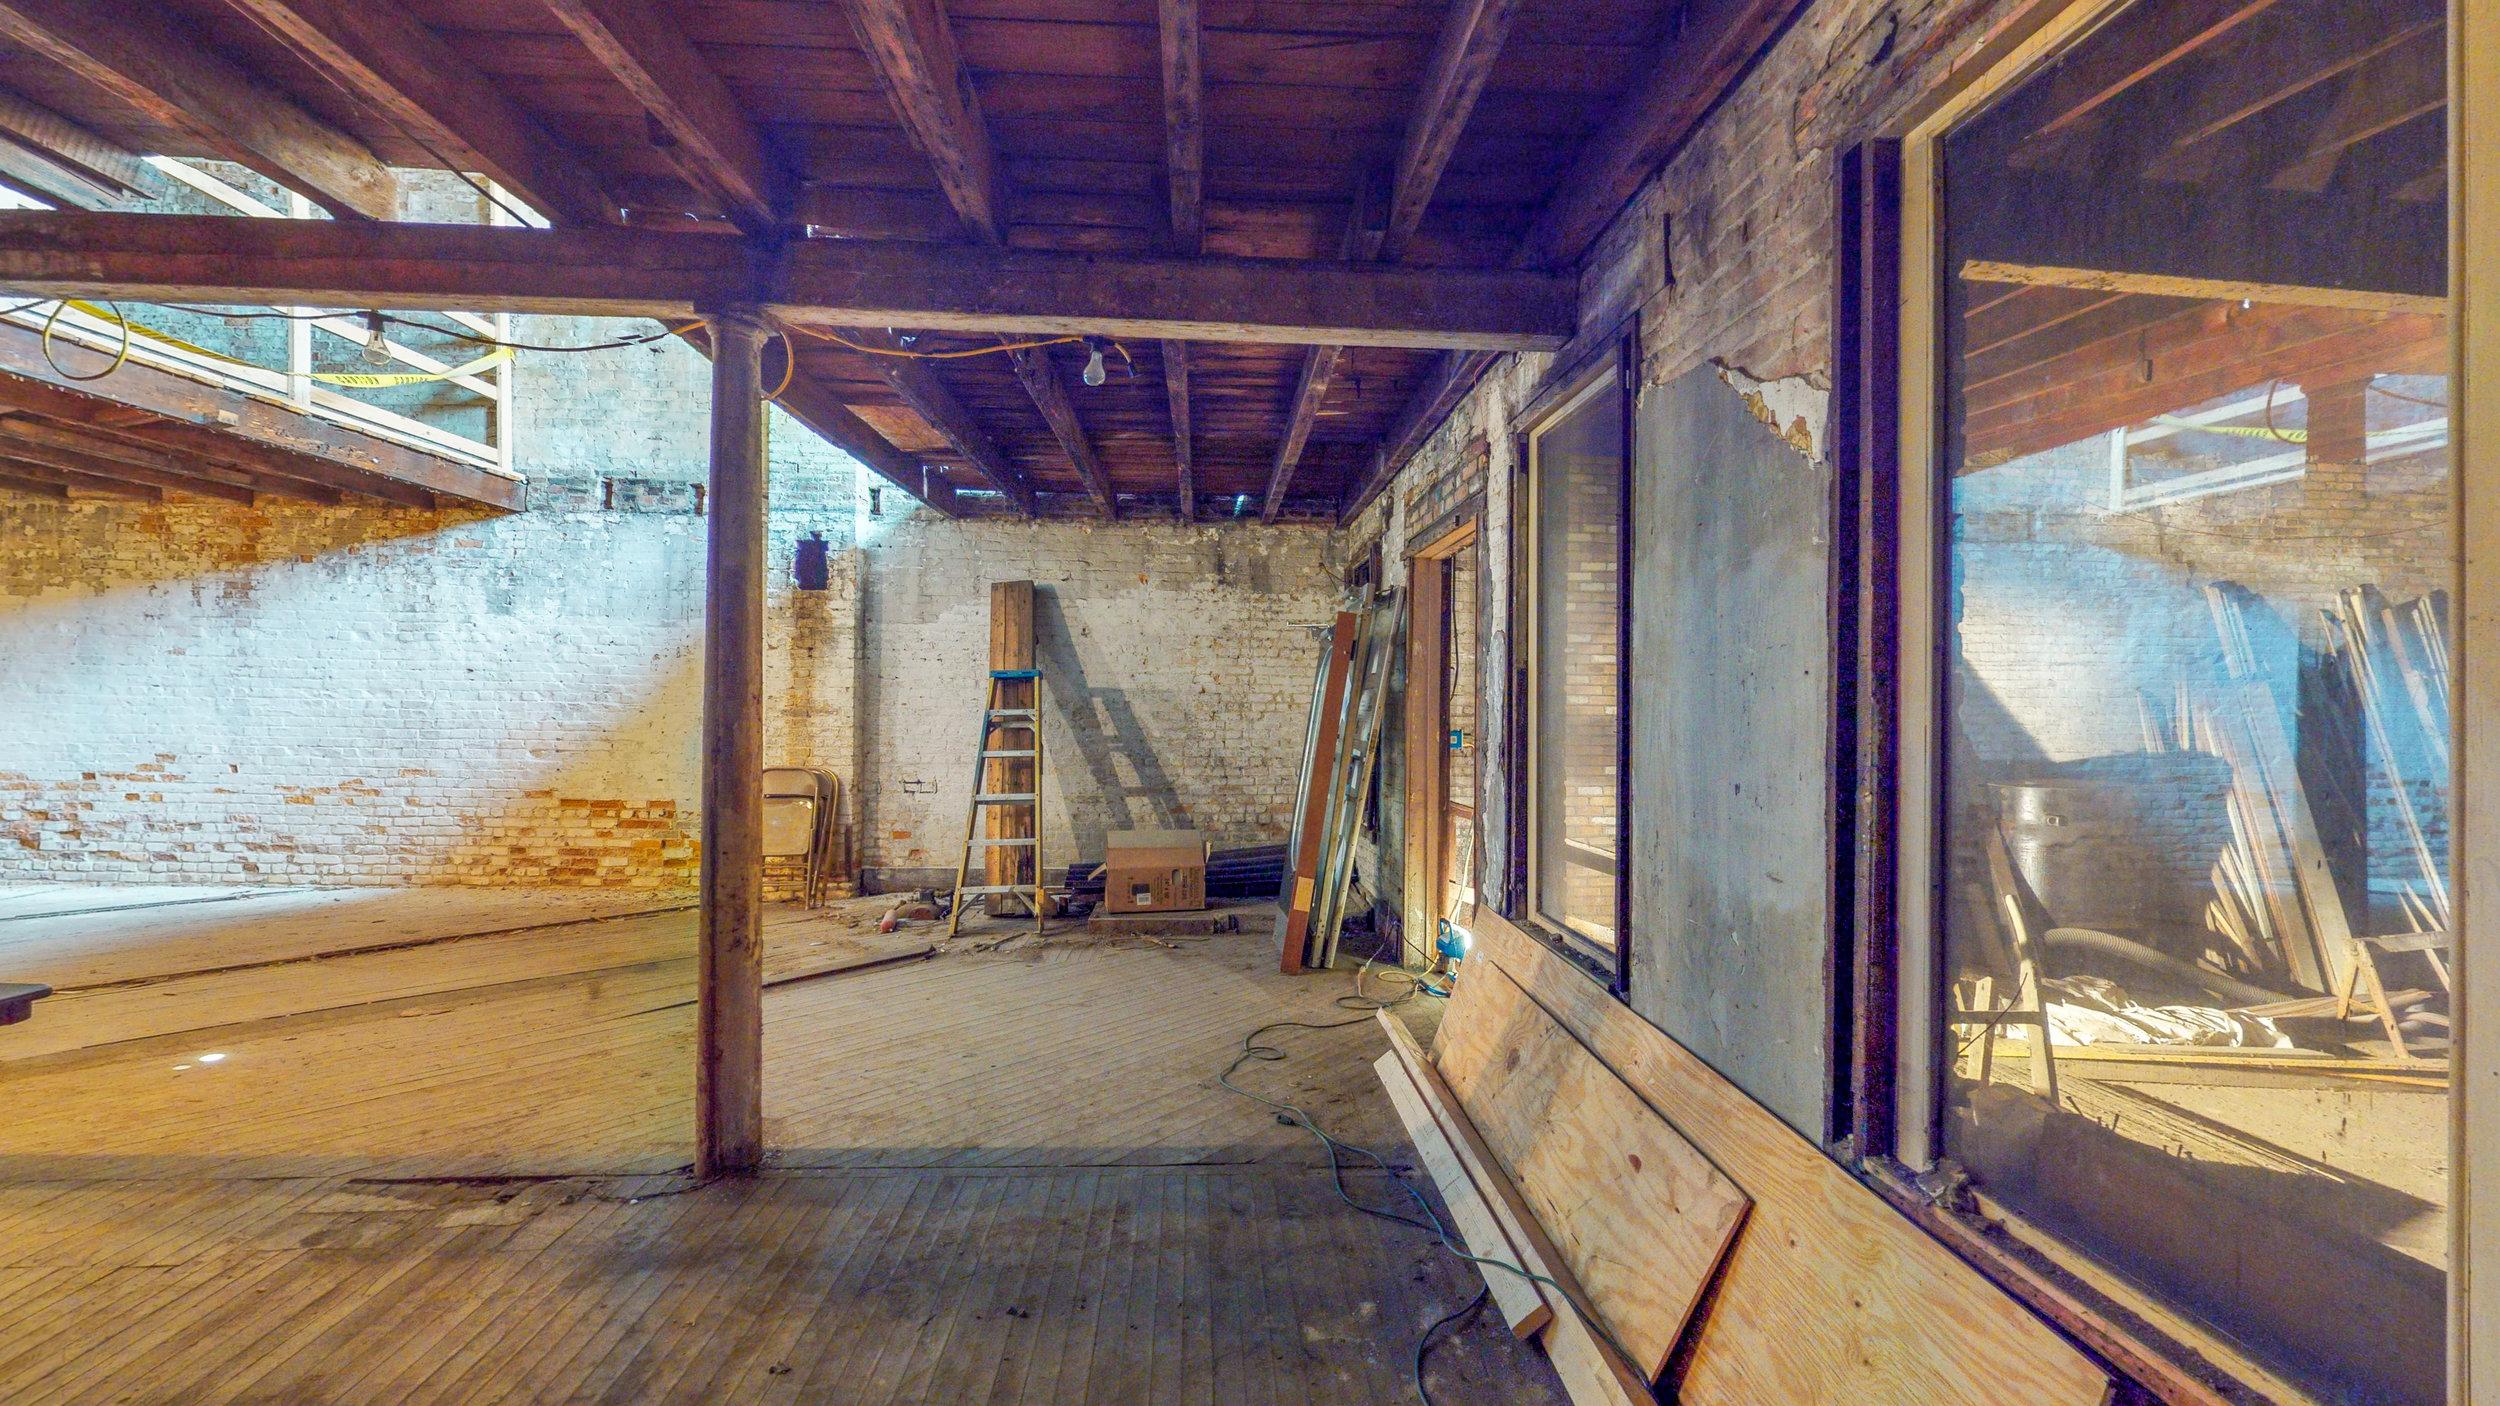 The-Van-Ostrande-Radliff-House-at-48-Hudson-08292019_123113.jpg